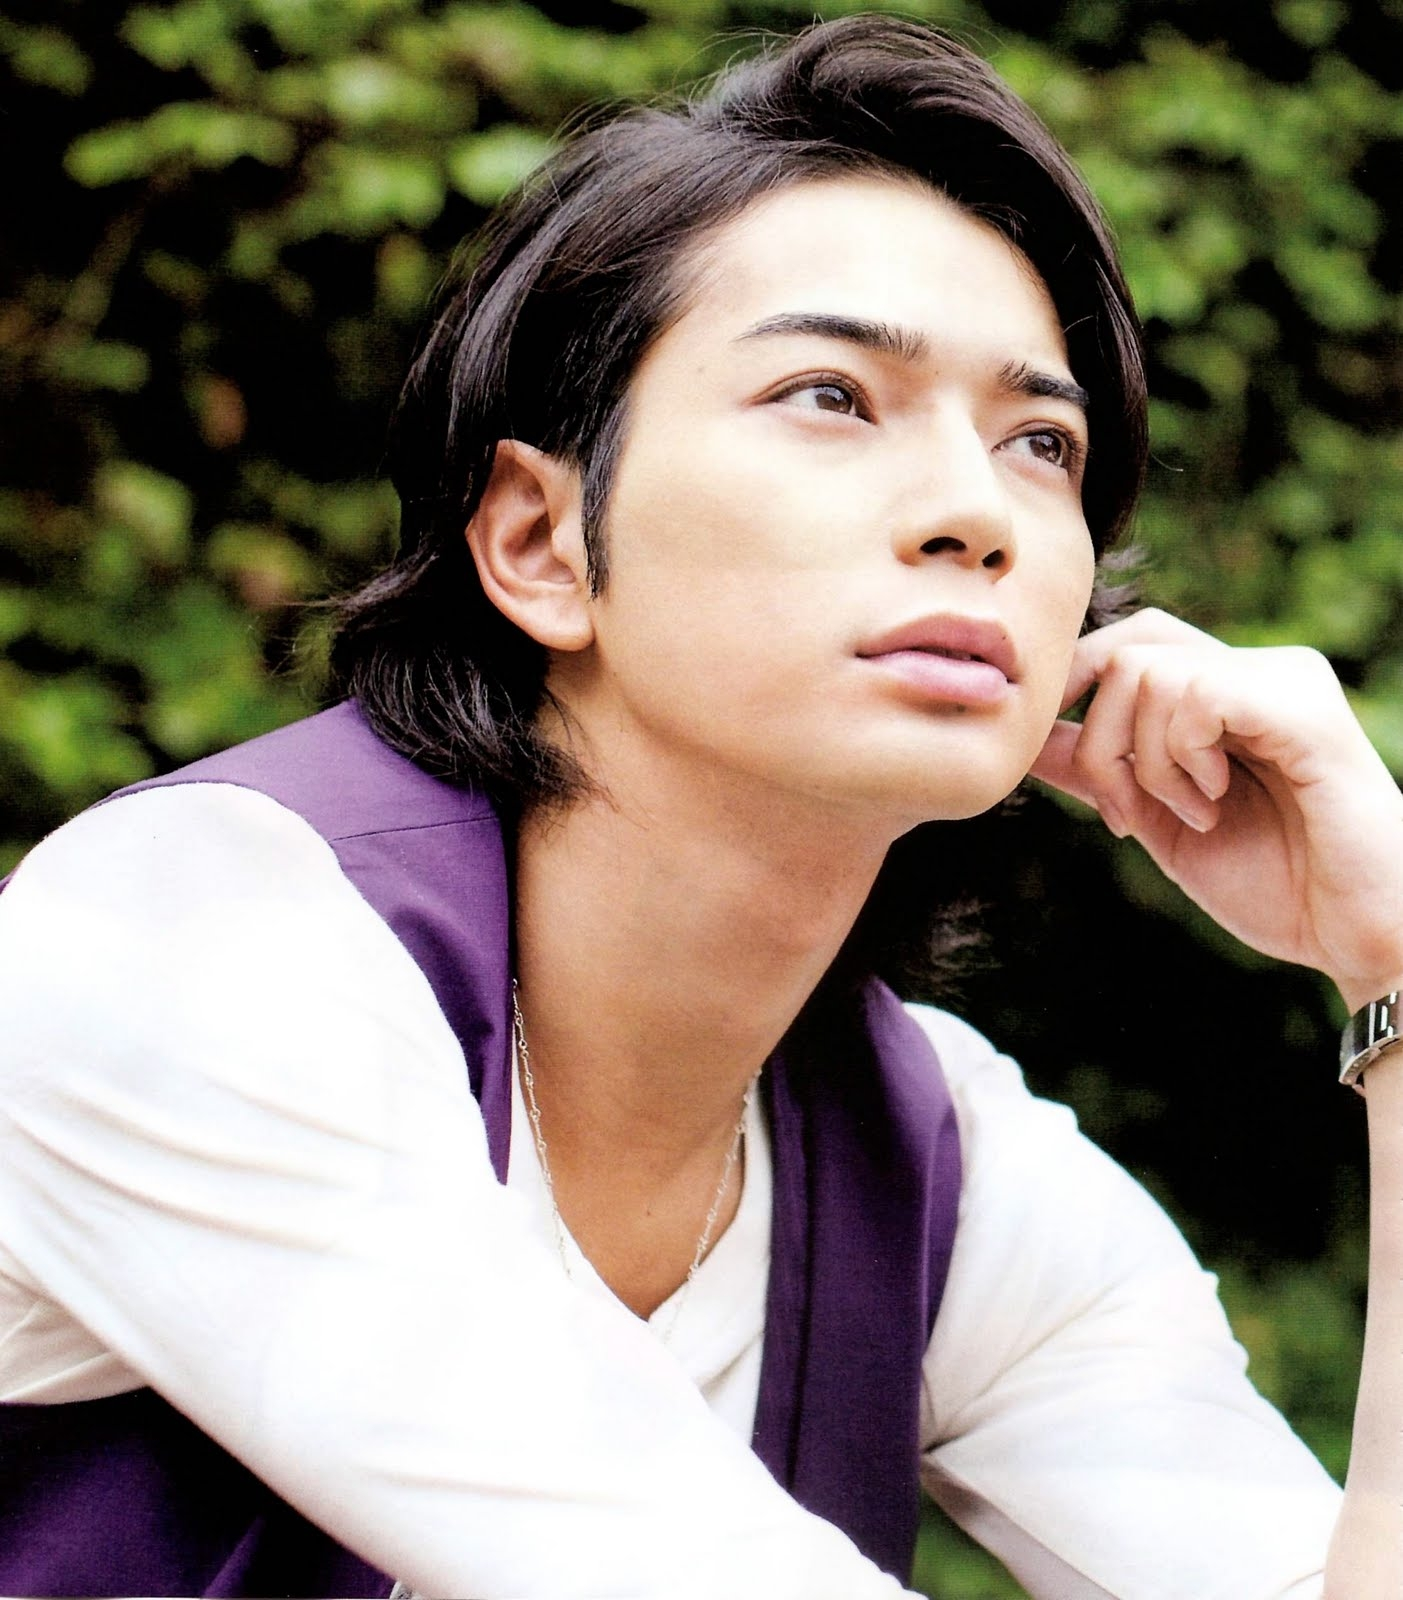 Японского парня геи